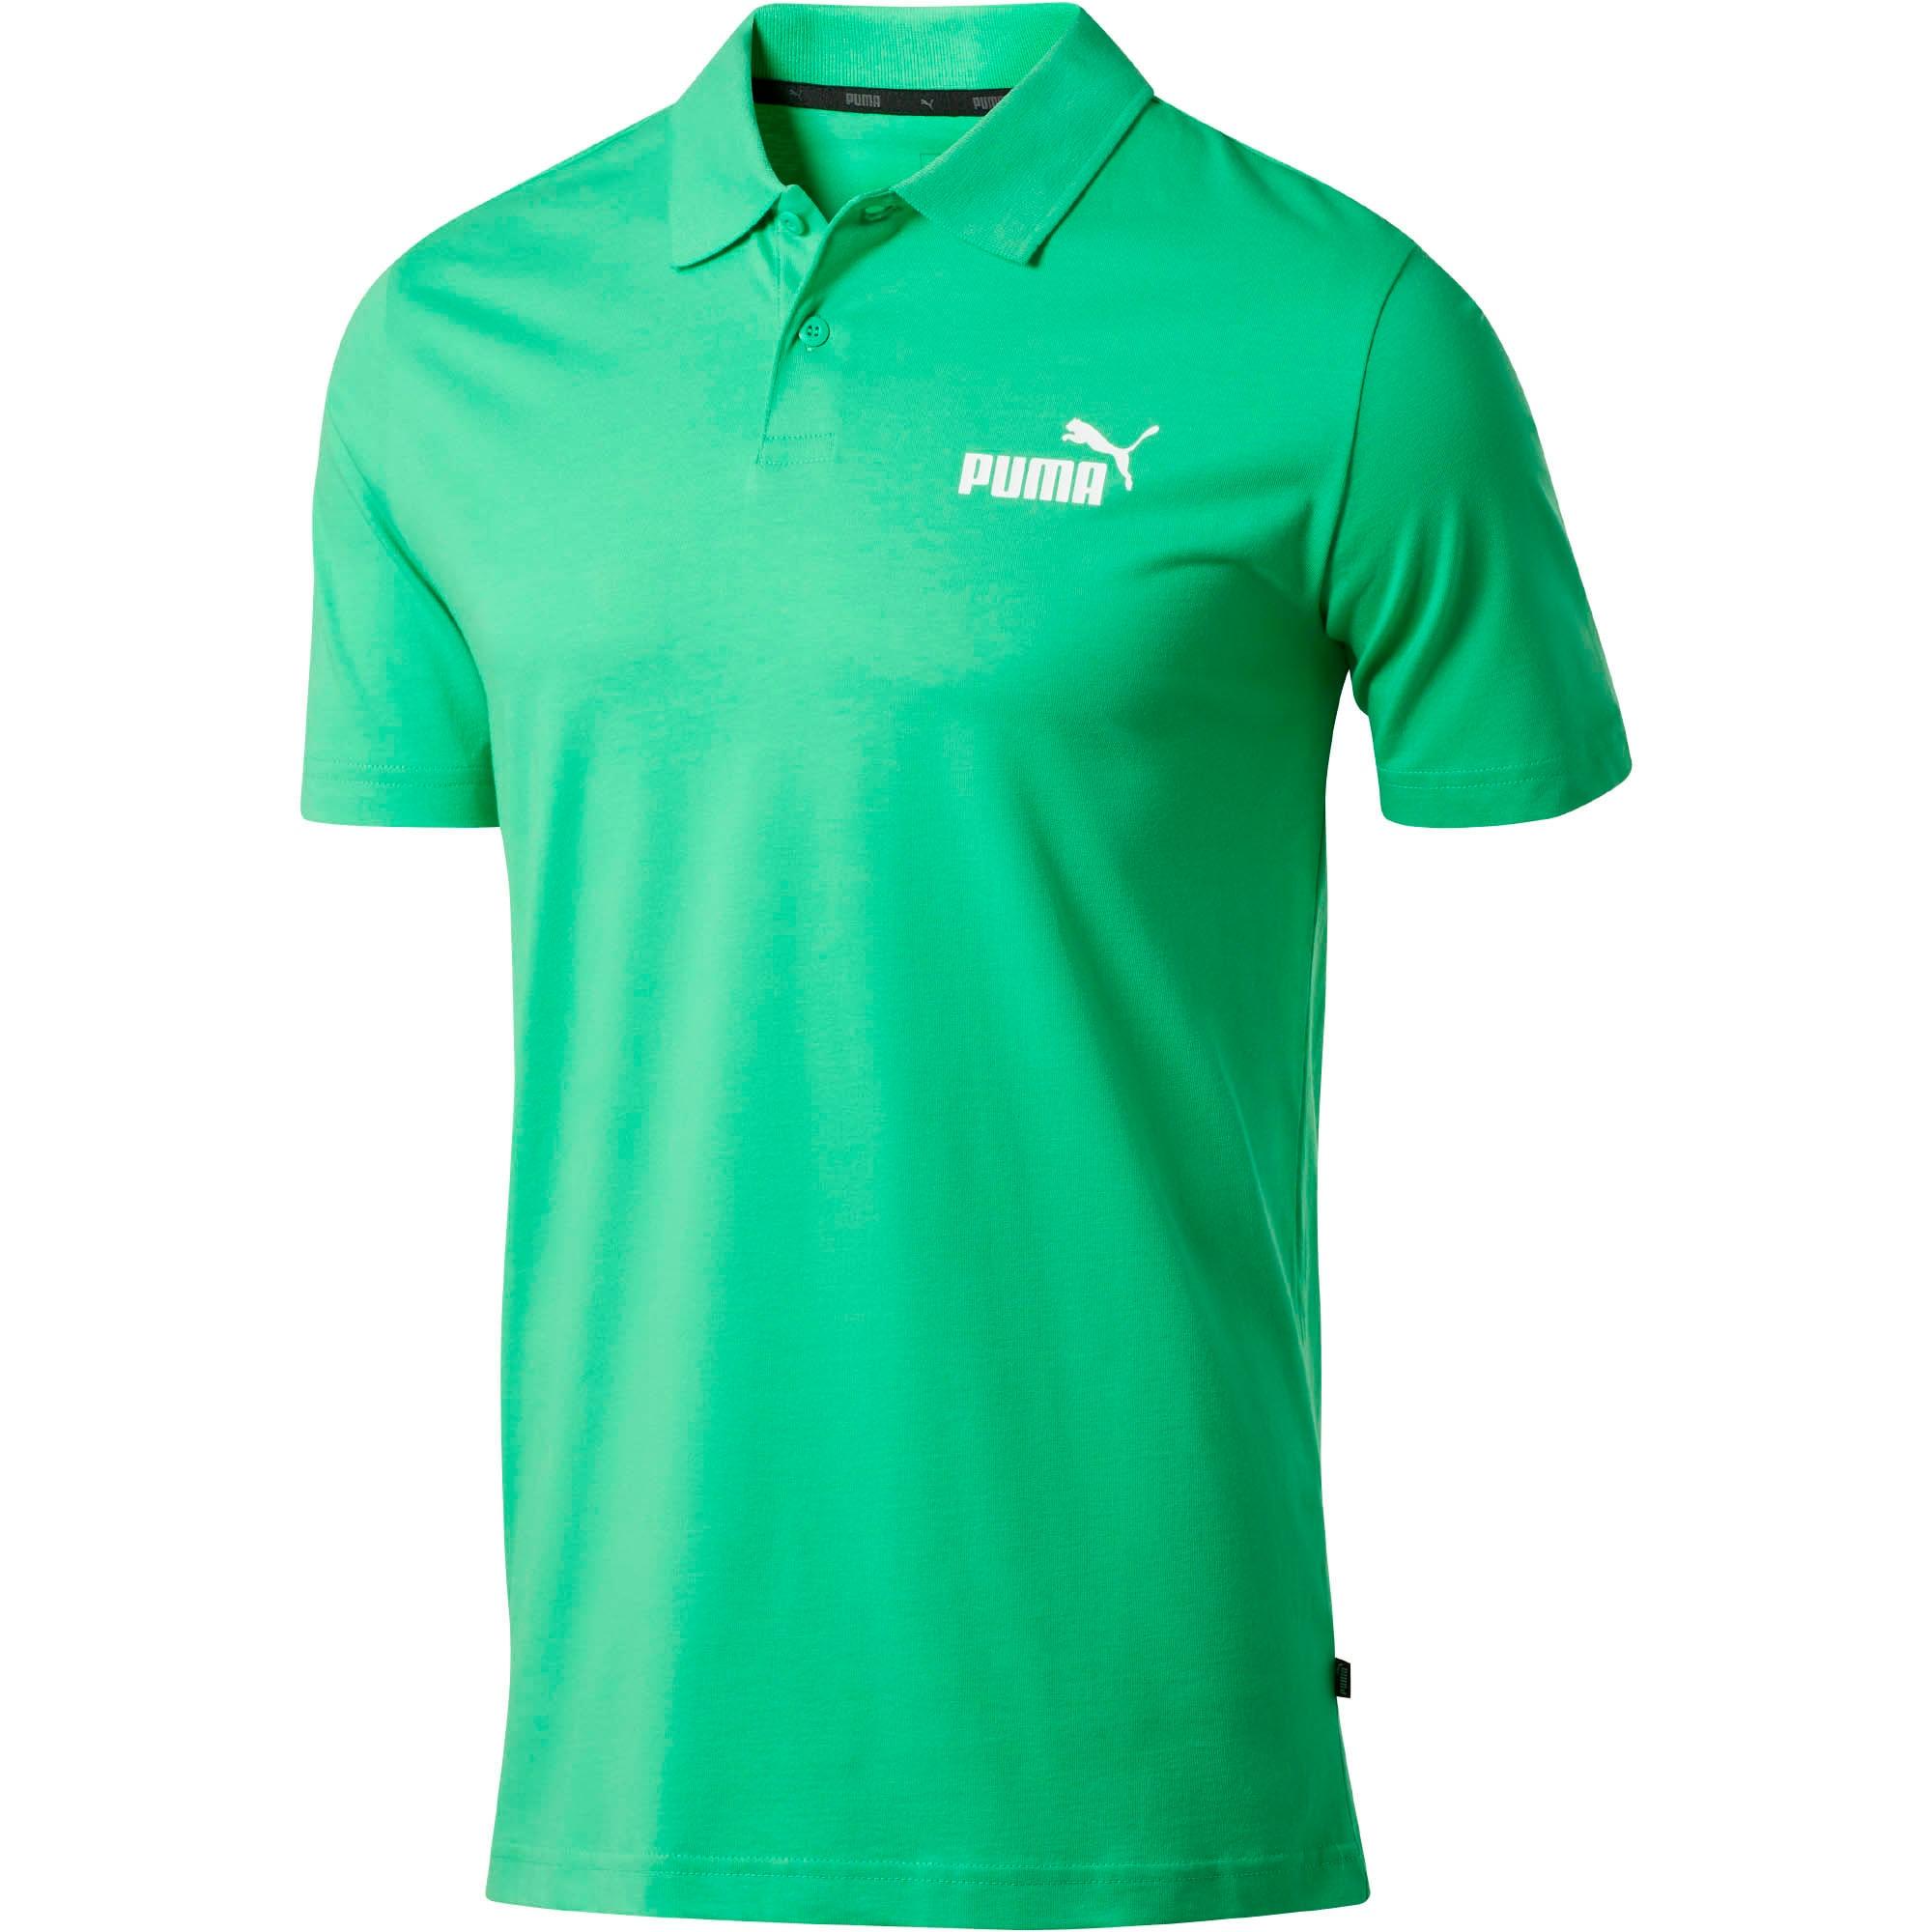 Thumbnail 1 of Essentials Men's Jersey Polo, Irish Green, medium